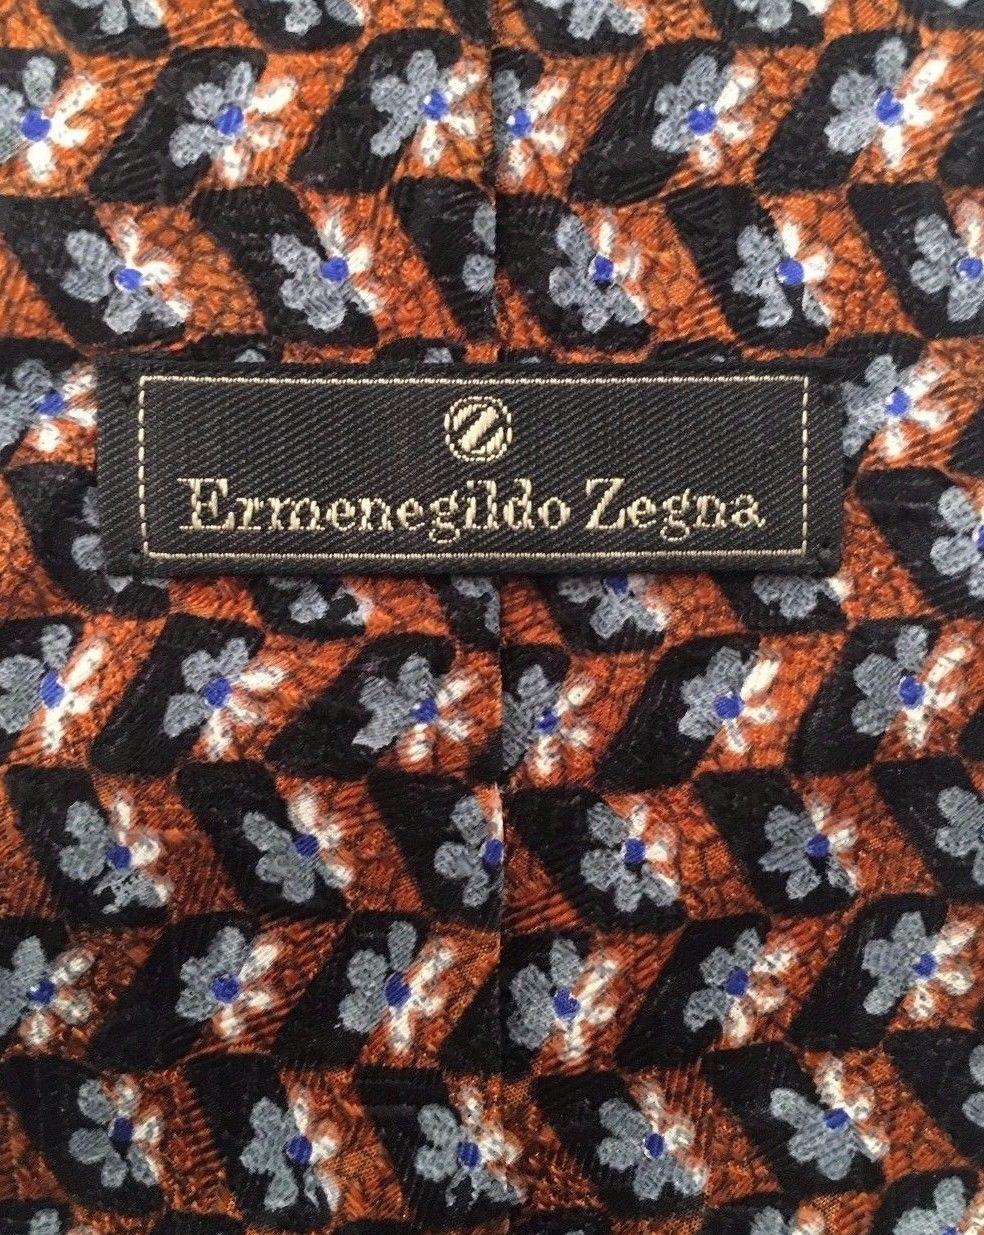 bec08a8d Ermenegildo Zegna Silk Tie Exclusive Design and 50 similar items